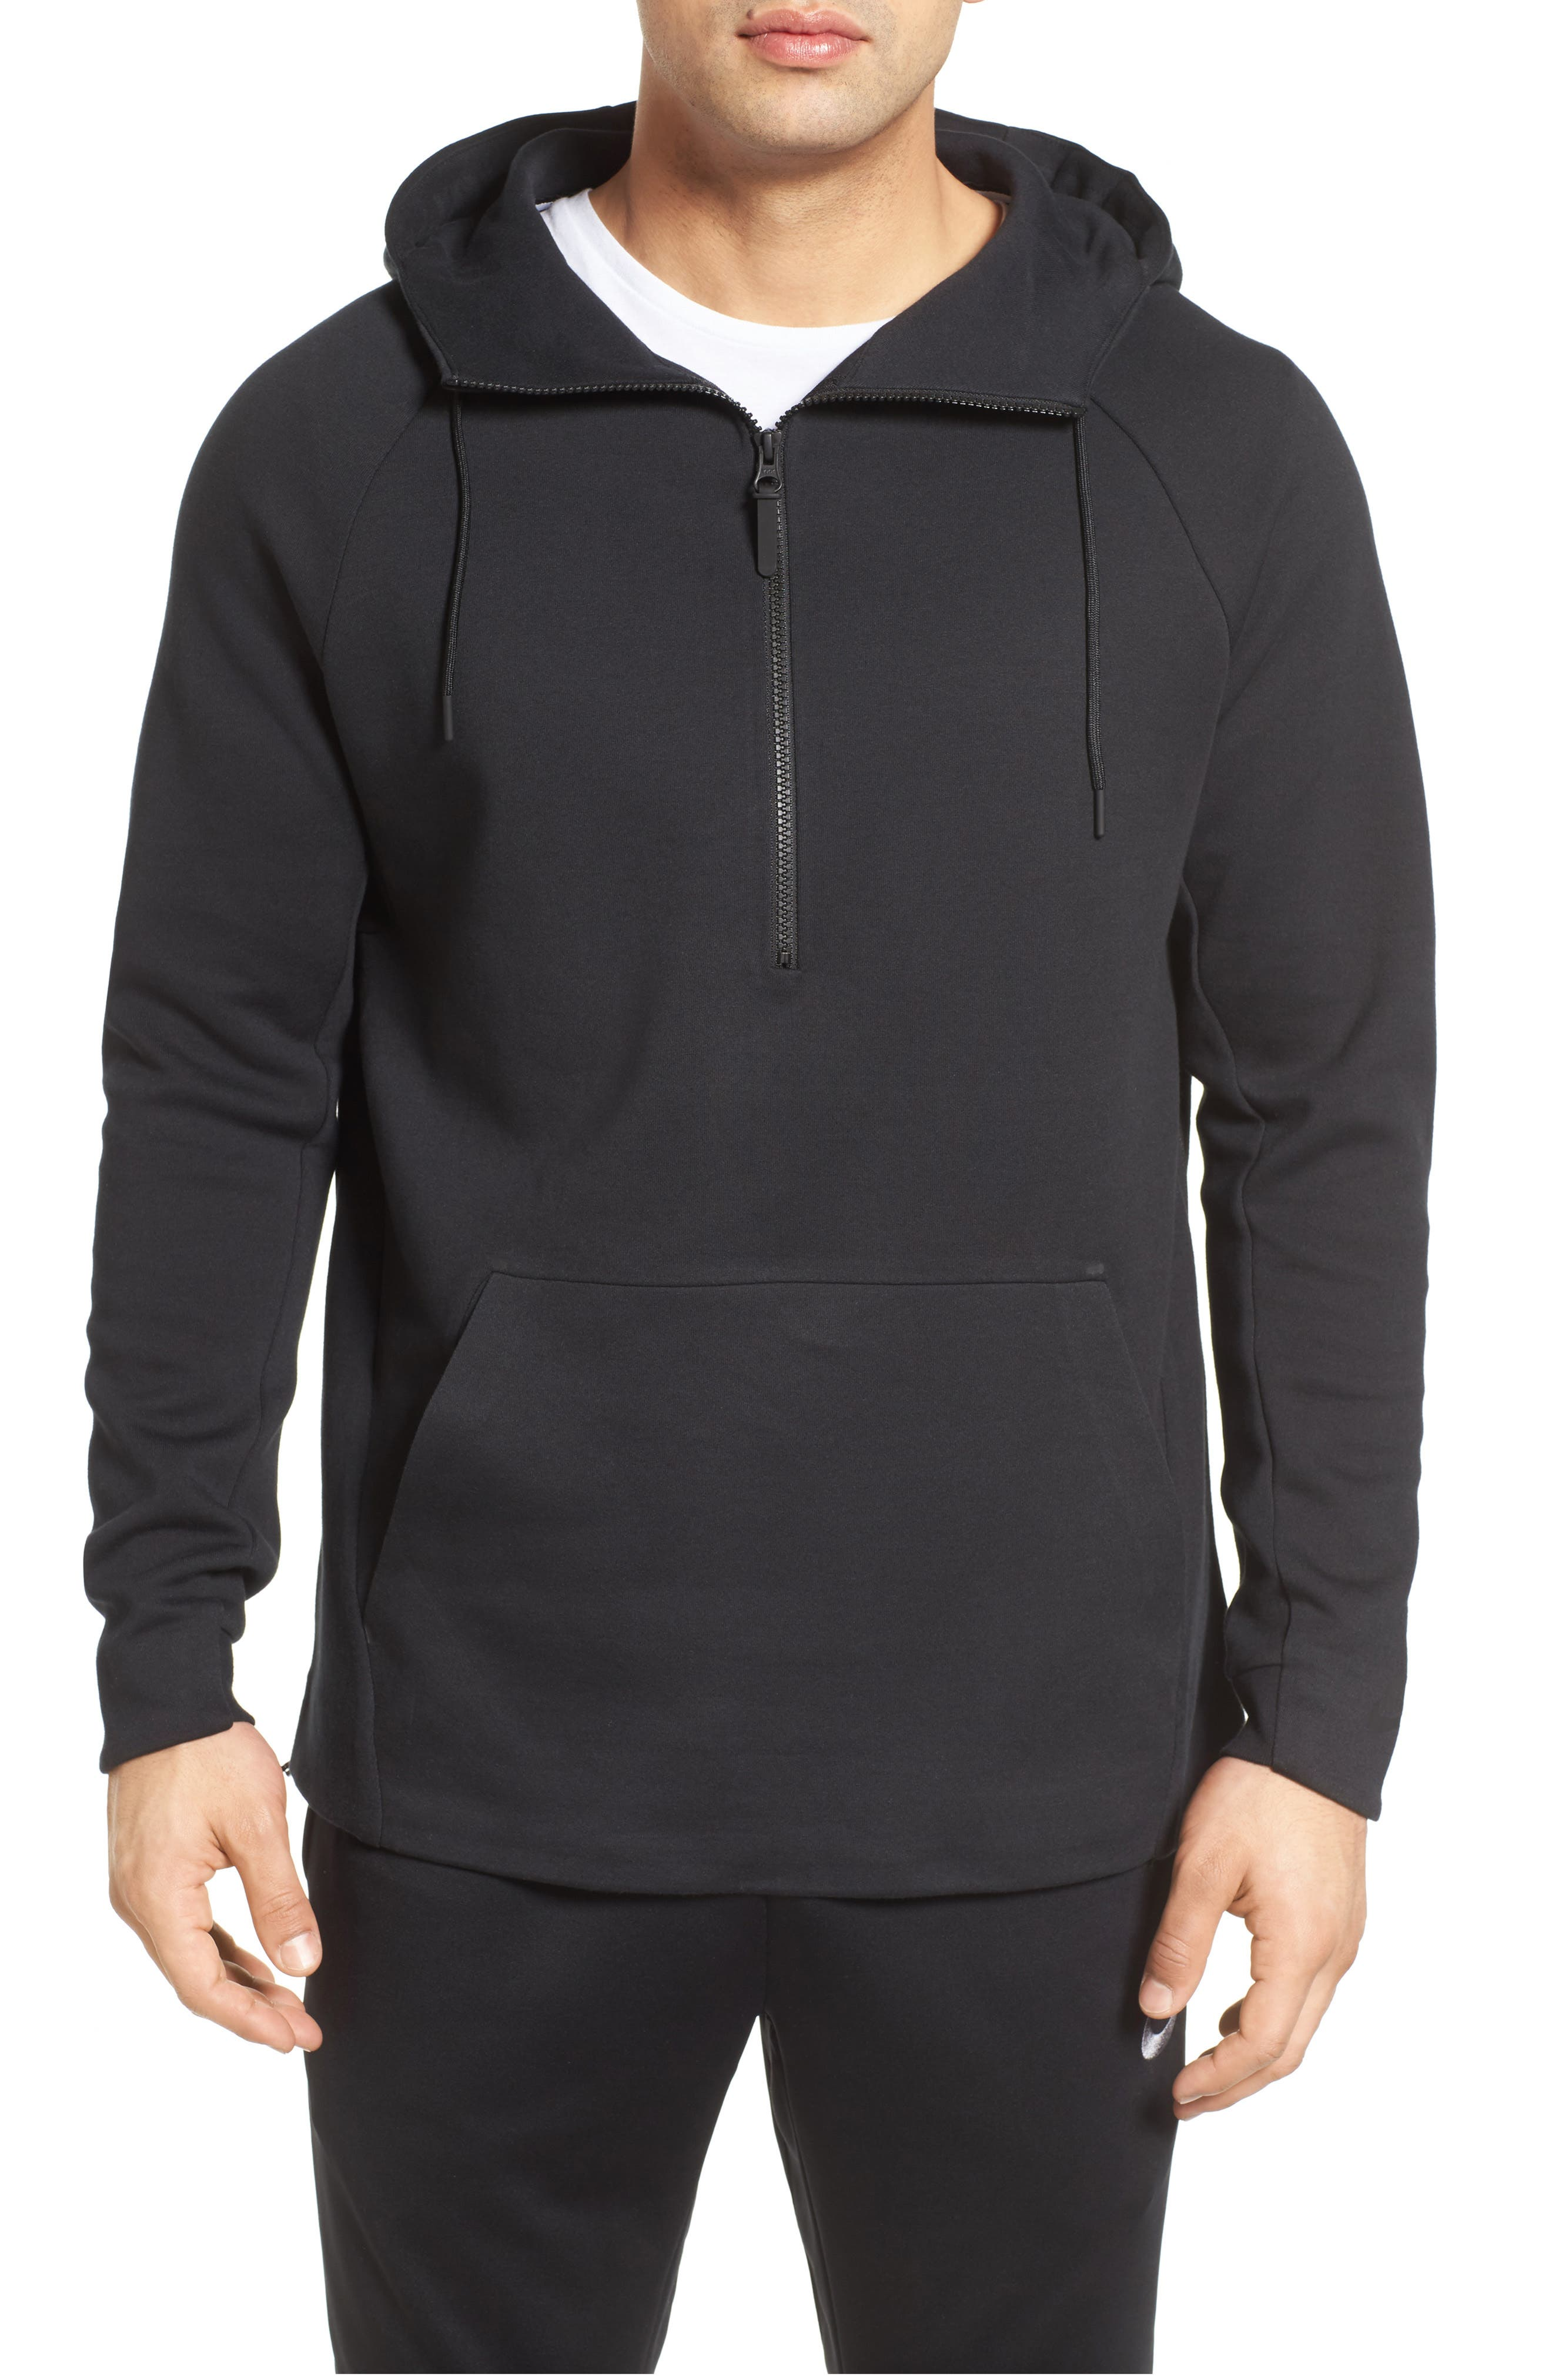 Half-Zip Pullover Hoodie,                             Main thumbnail 1, color,                             Black/ Black/ Black